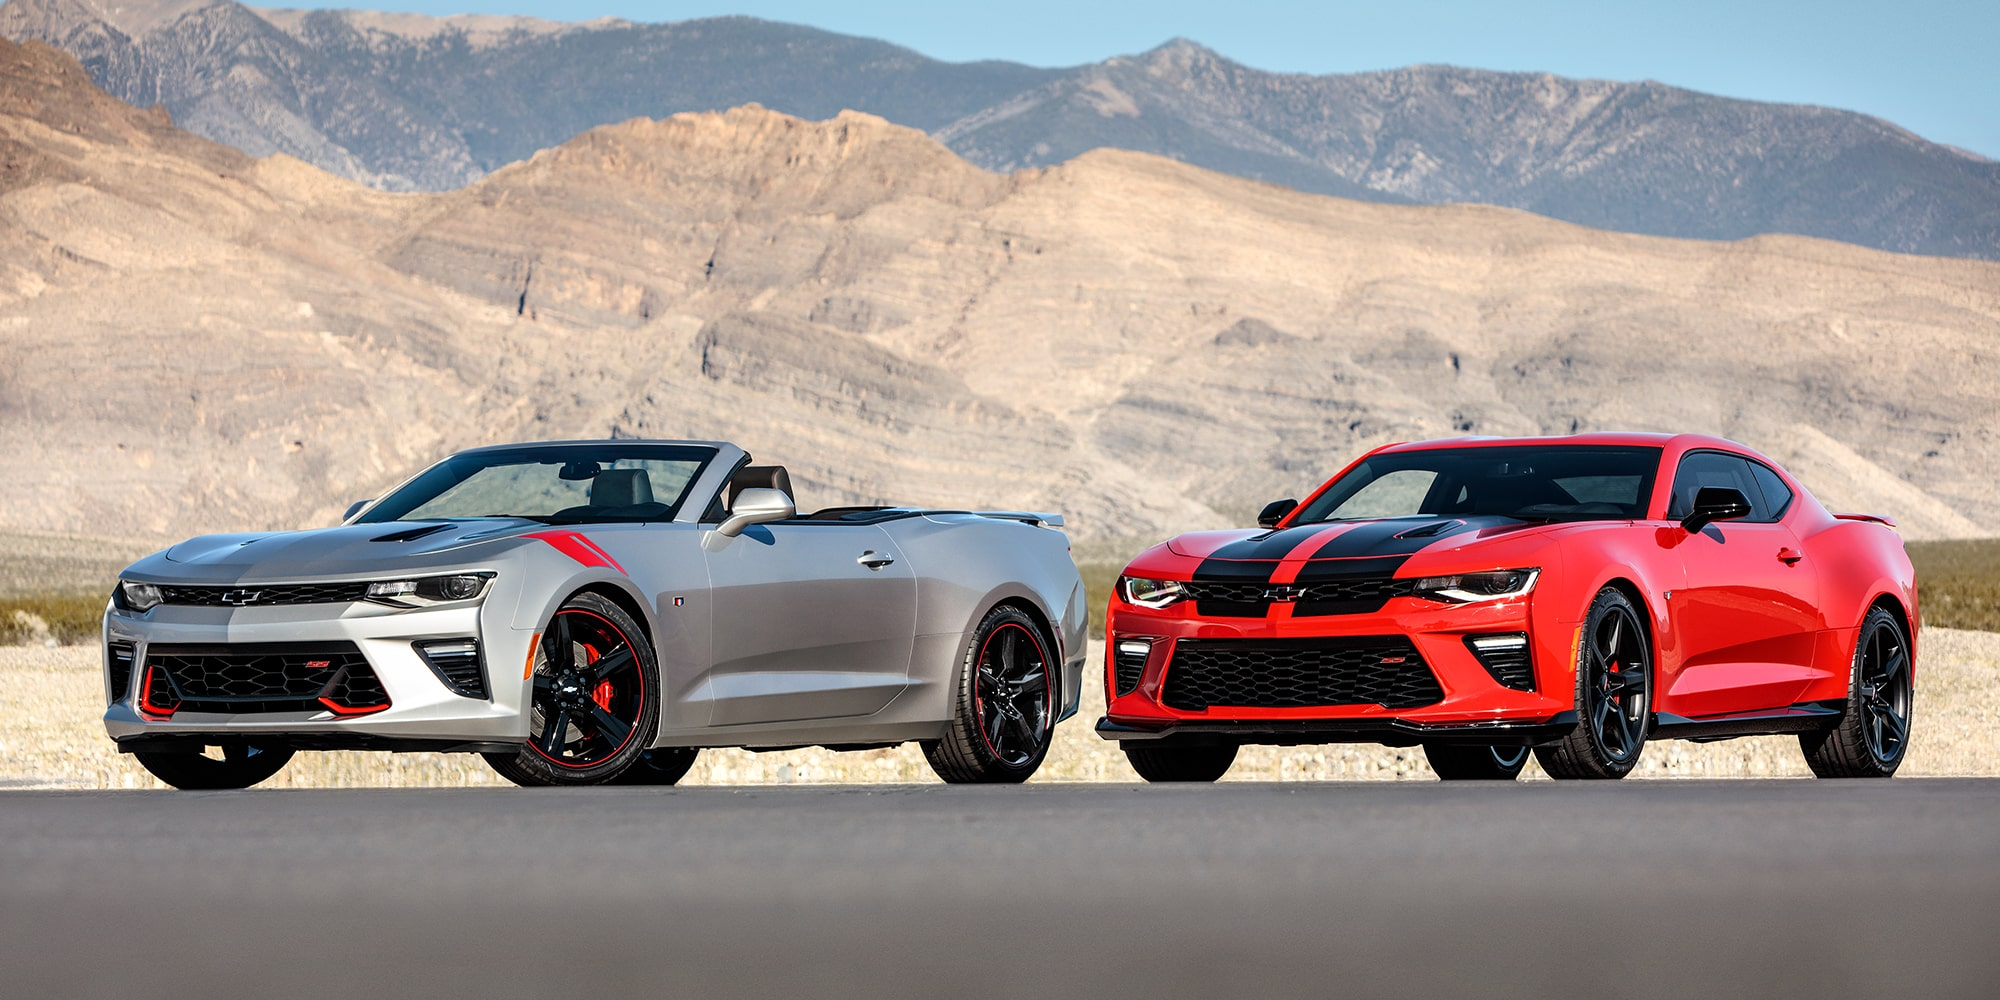 91 best camero images on Pinterest | Dream cars, Chevrolet camaro ...